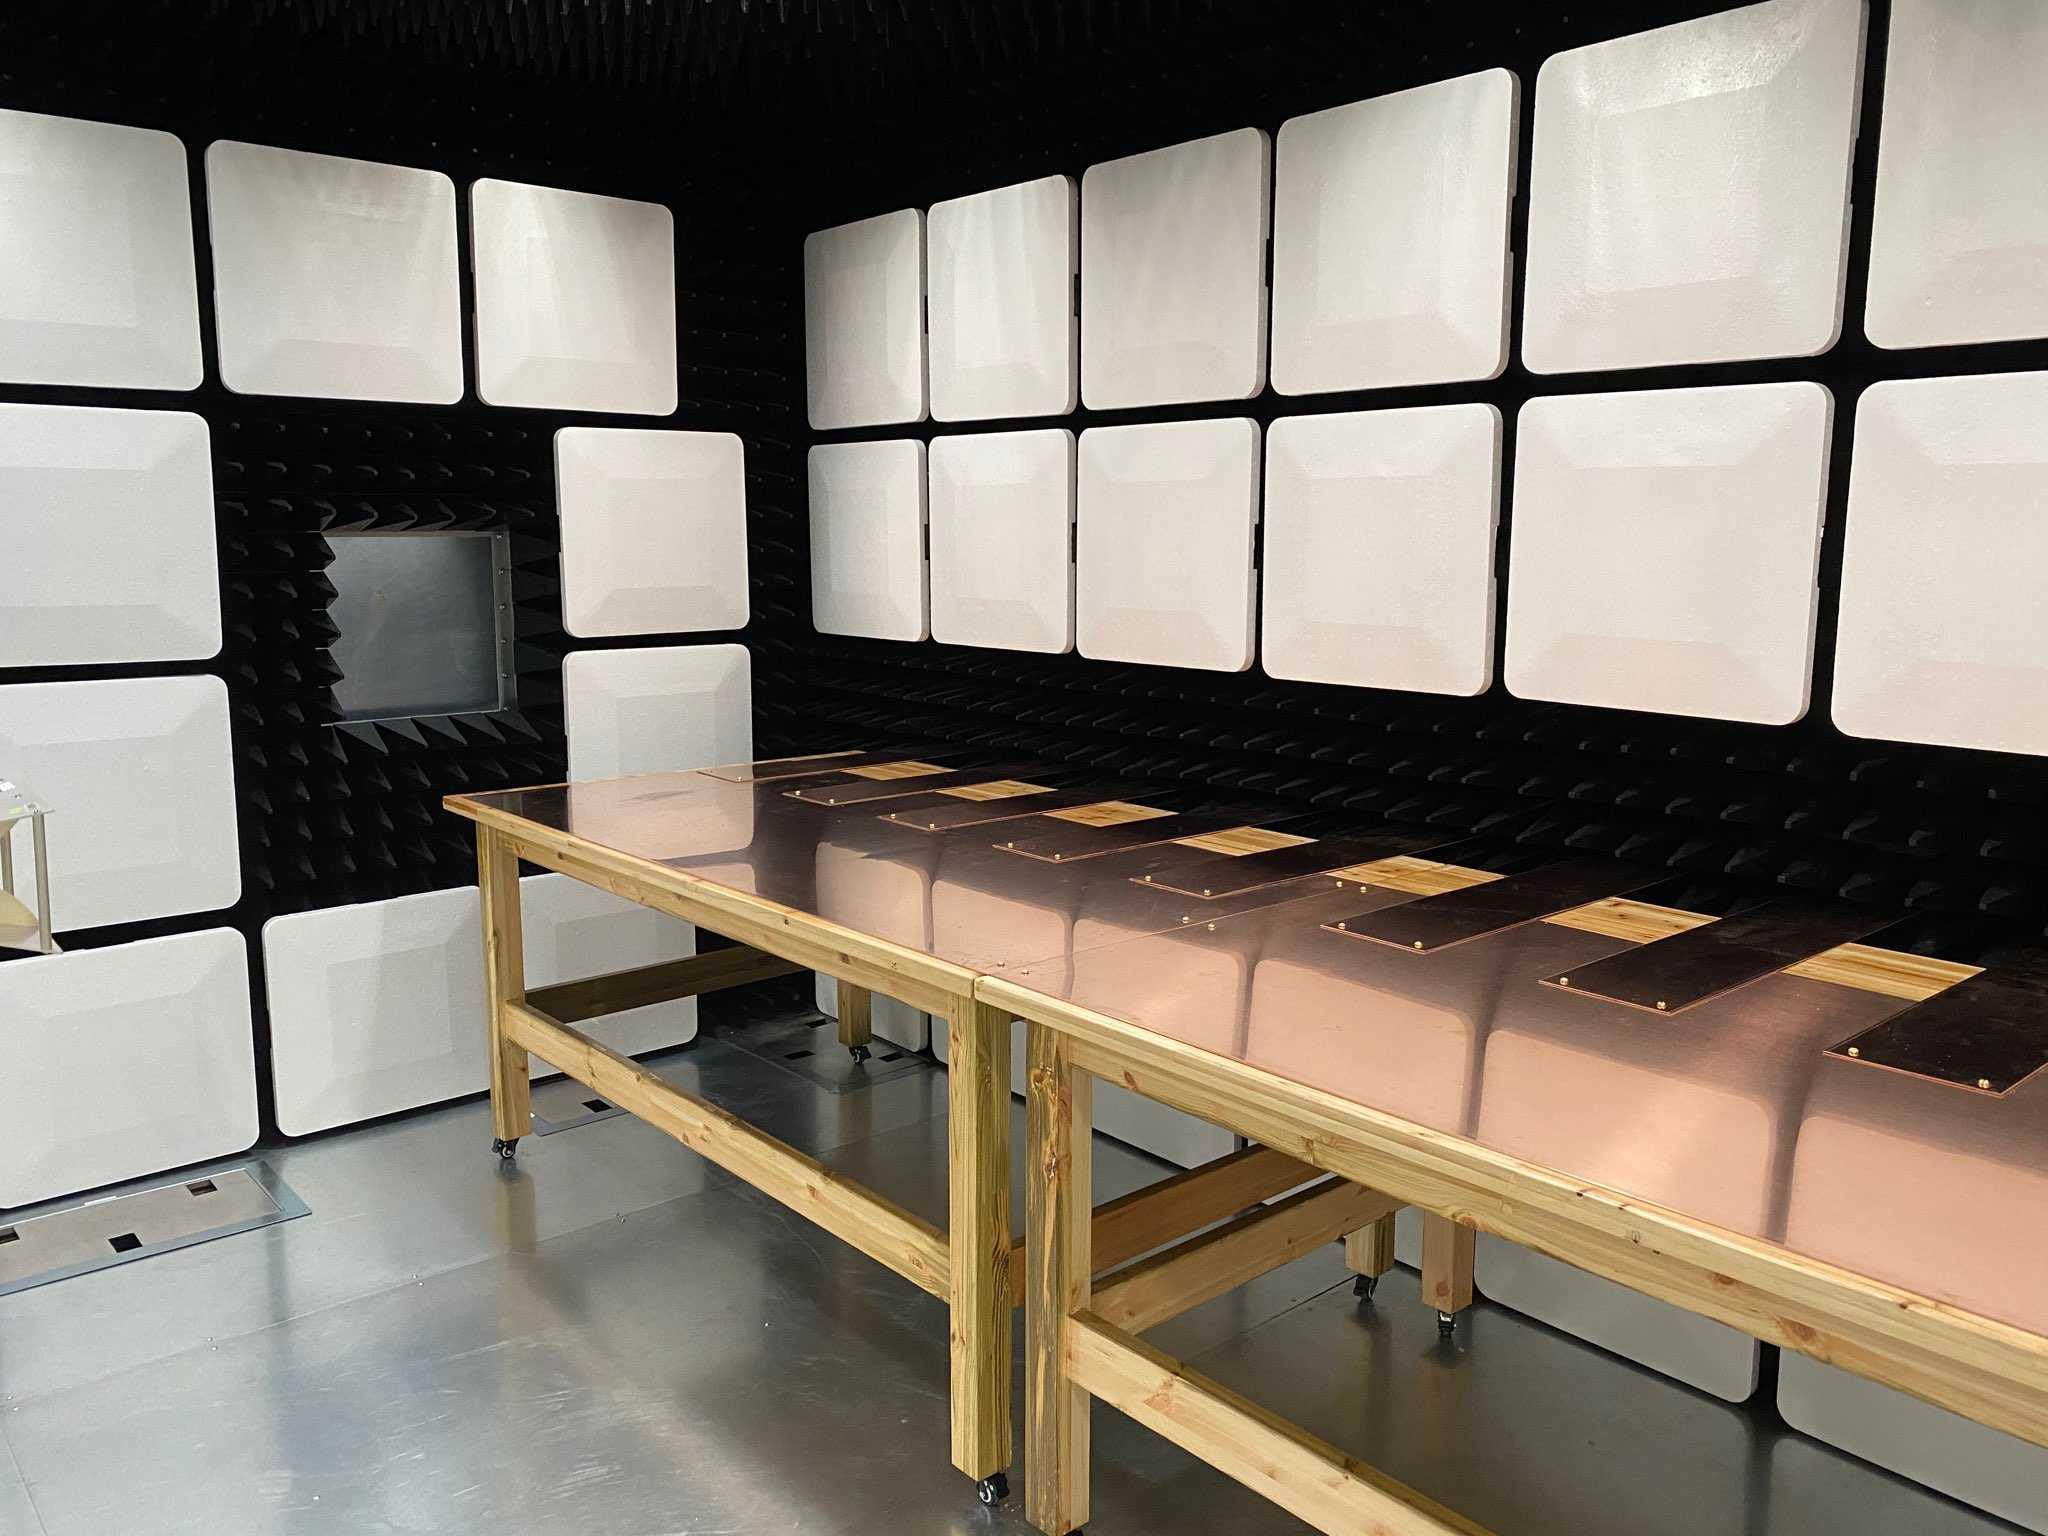 EMC Test Chamber MIL STD 461